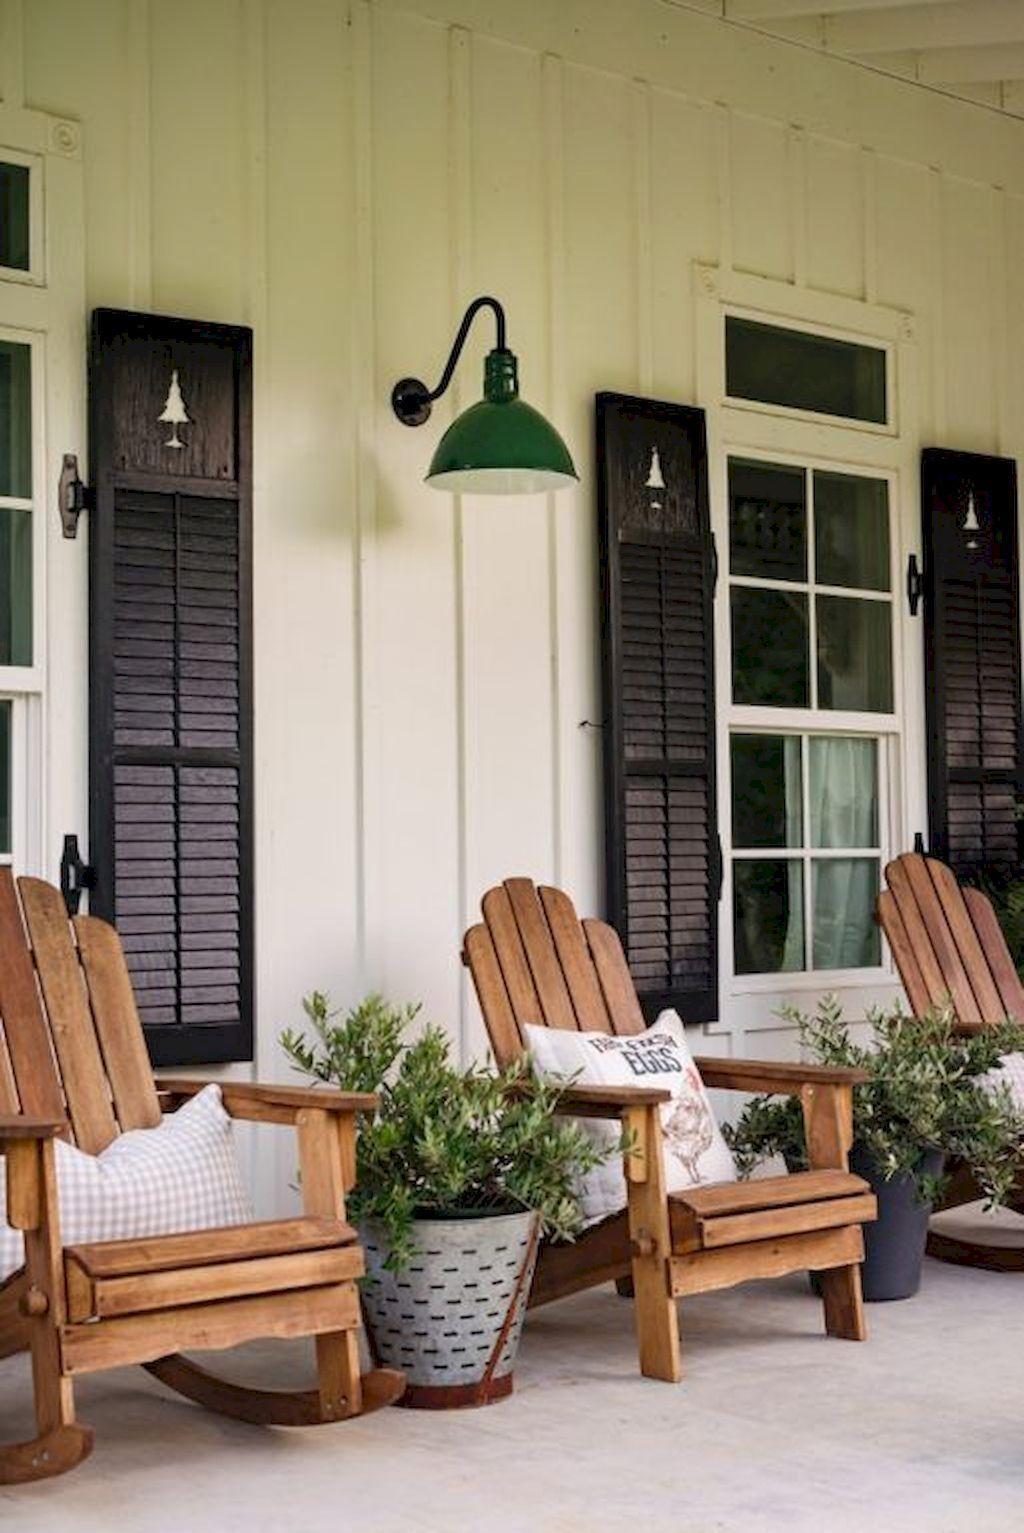 54 Best Farmhouse Front Porch Decorating Ideas For 2019 House With Porch Farmhouse Front Porches Front Porch Decorating